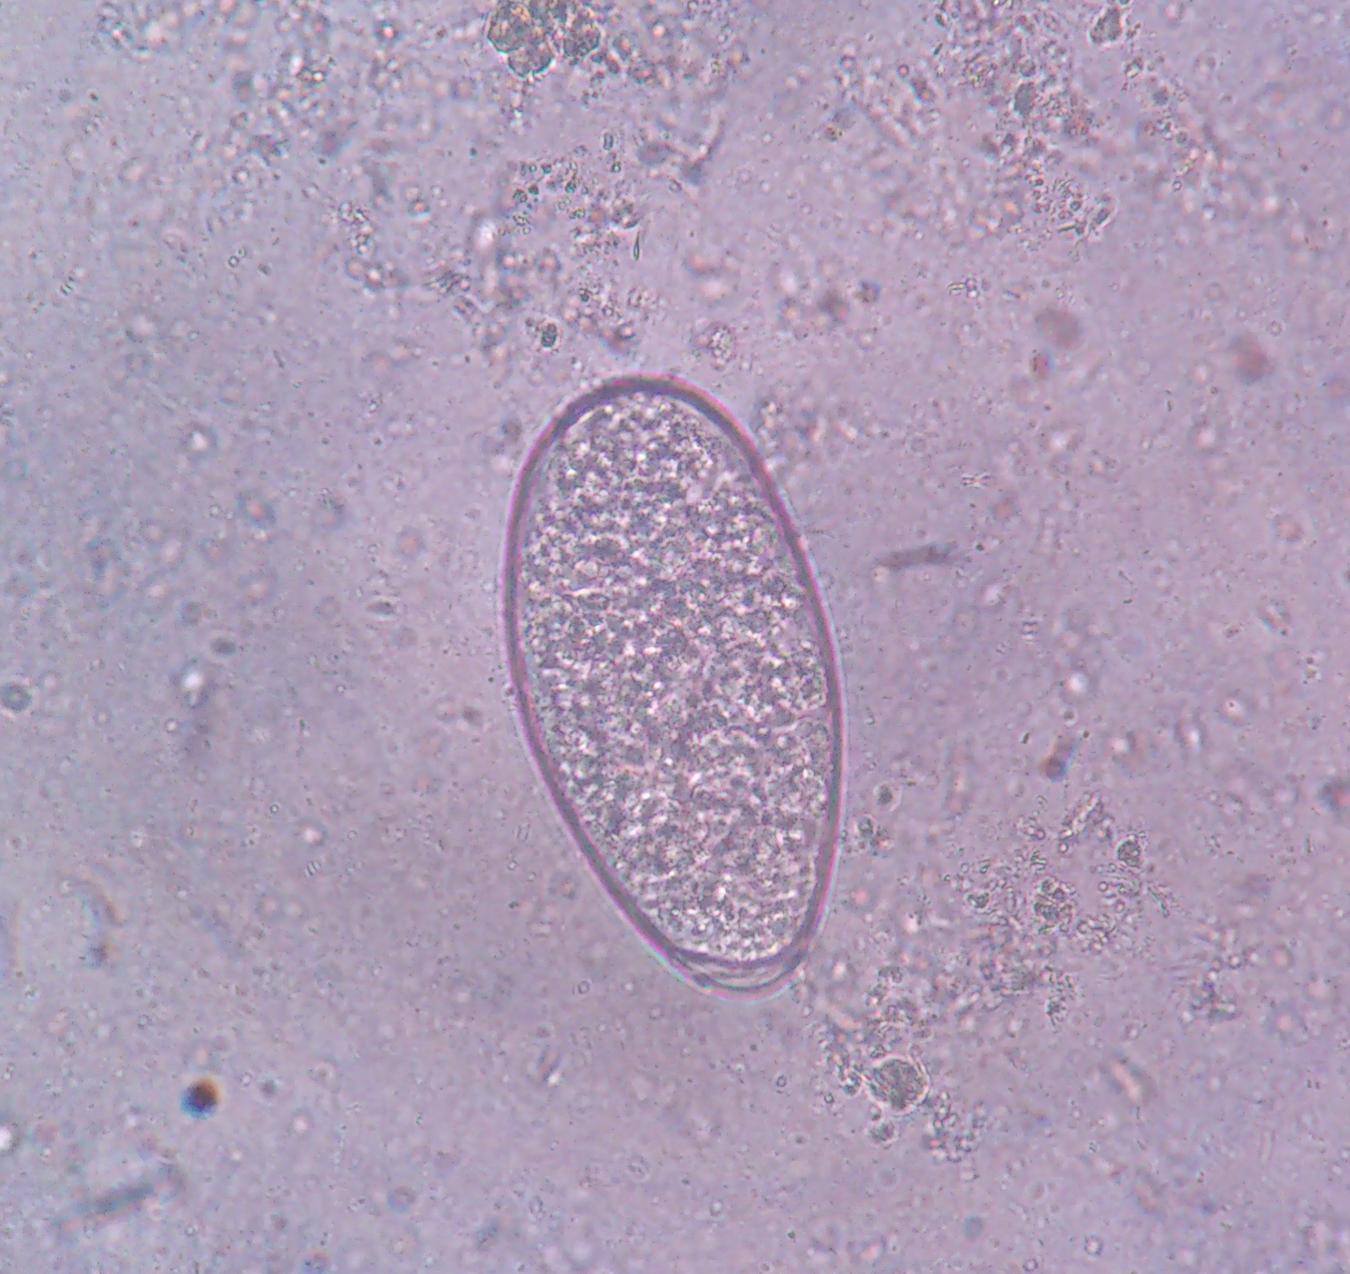 Creepy Dreadful Wonderful Parasites October 2012